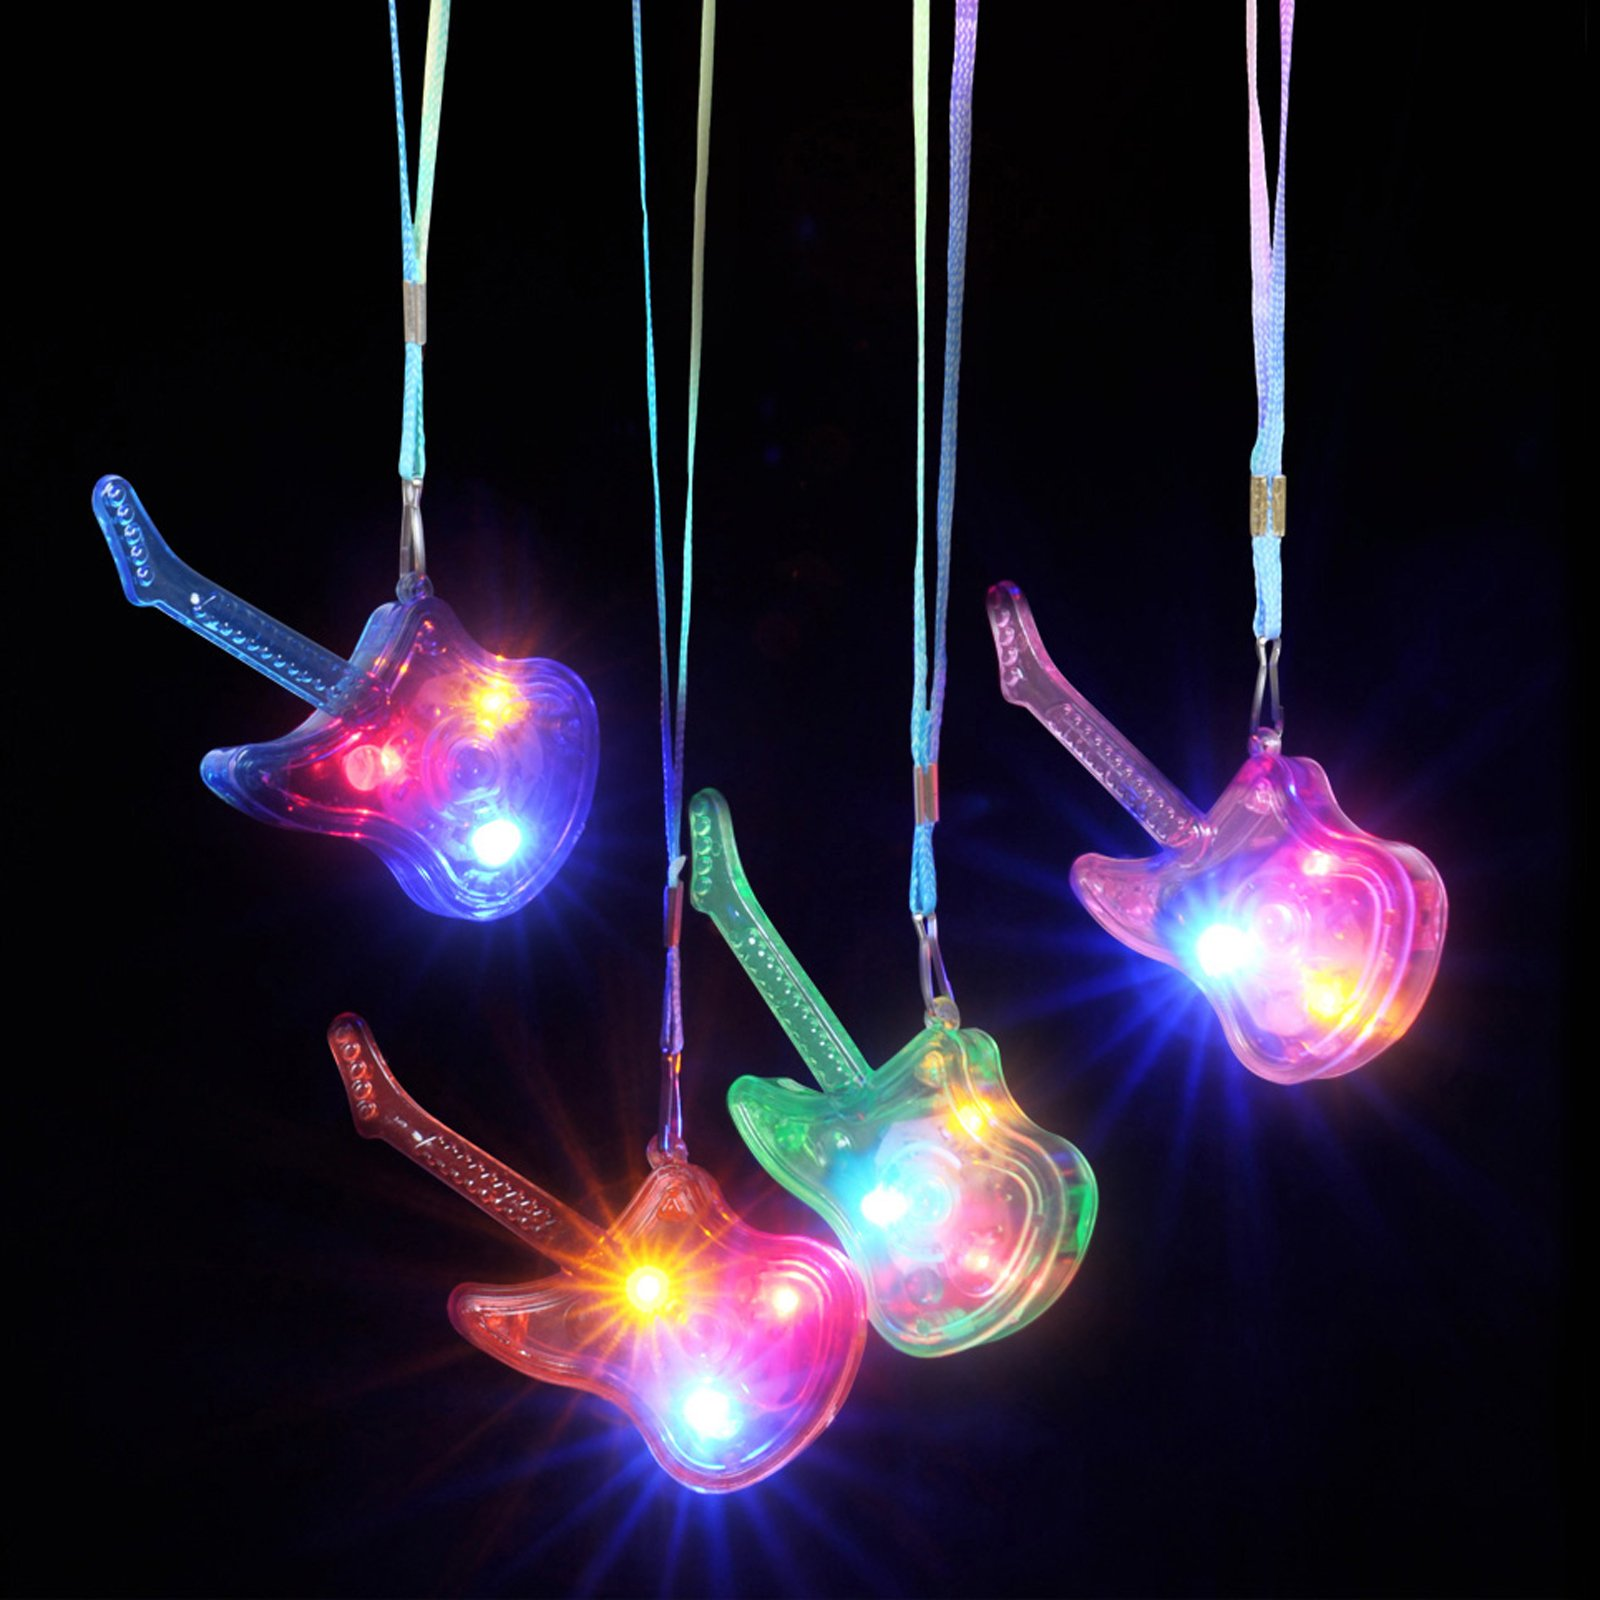 Rhode Island Novelty 3.75'' Light-up Guitar Necklace Childrens Pretend Play